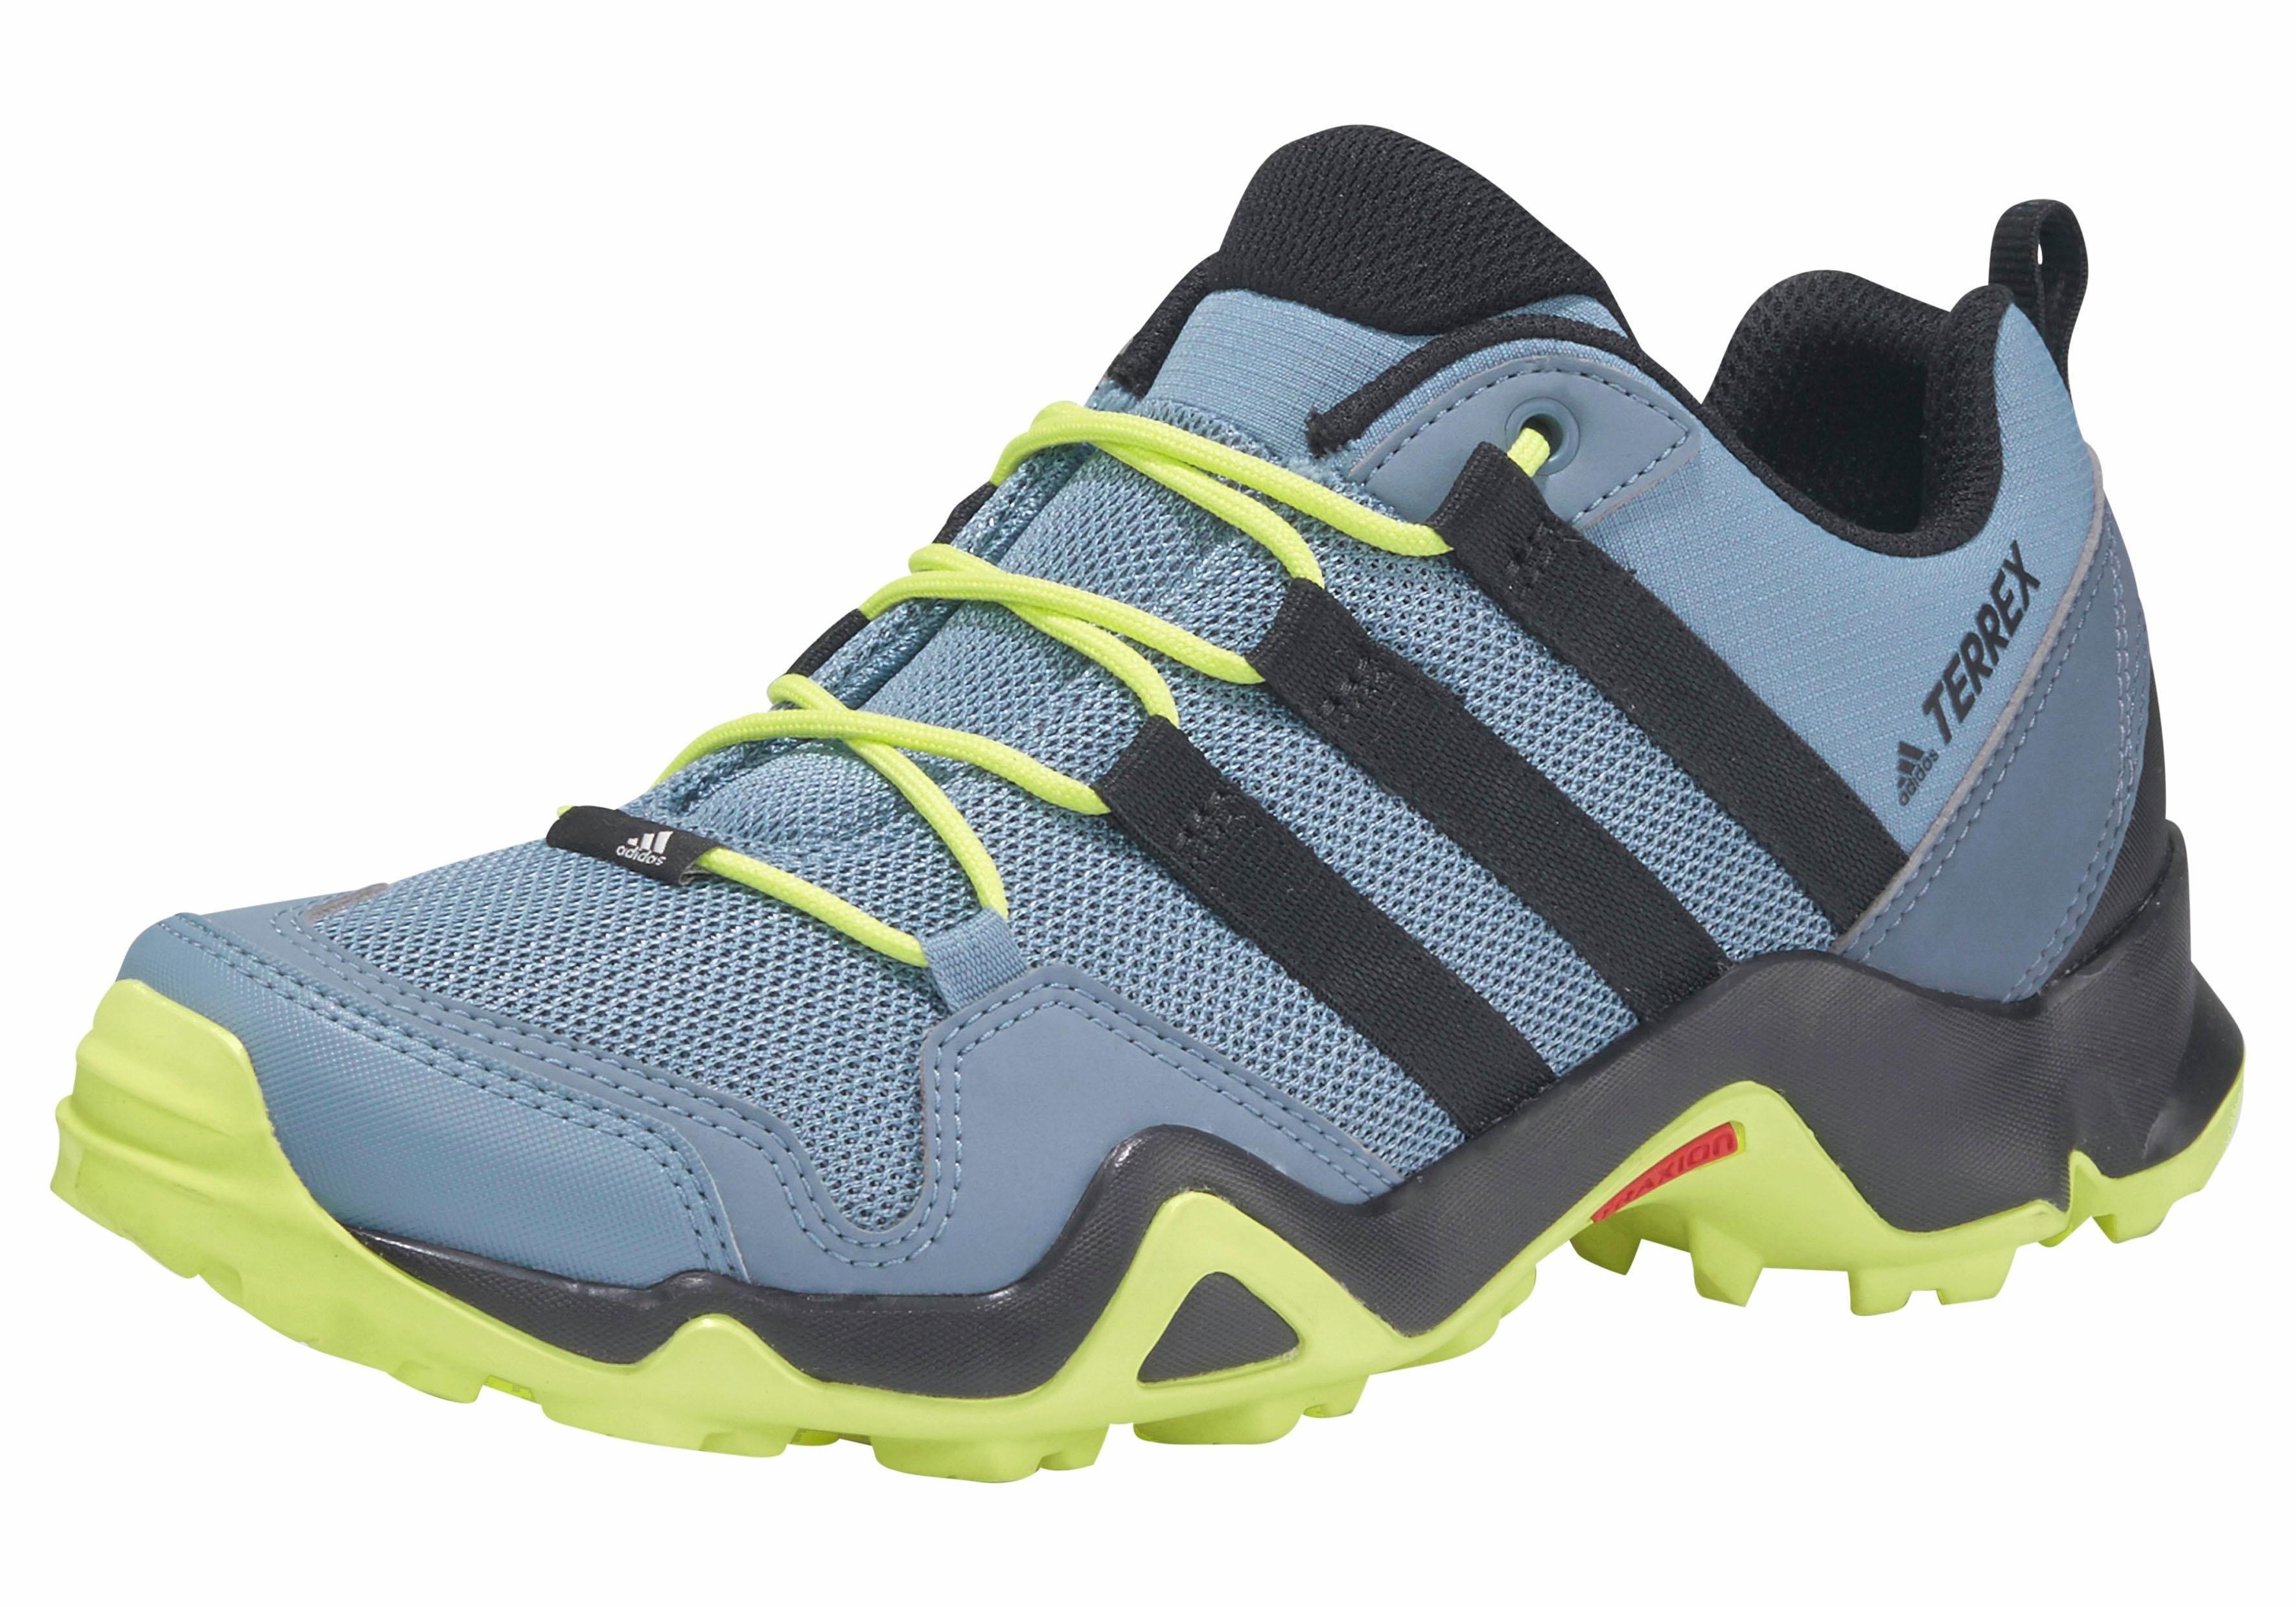 3efa07d50a8 adidas Performance outdoorschoenen »Terrex AX2 R W« koop je bij | OTTO